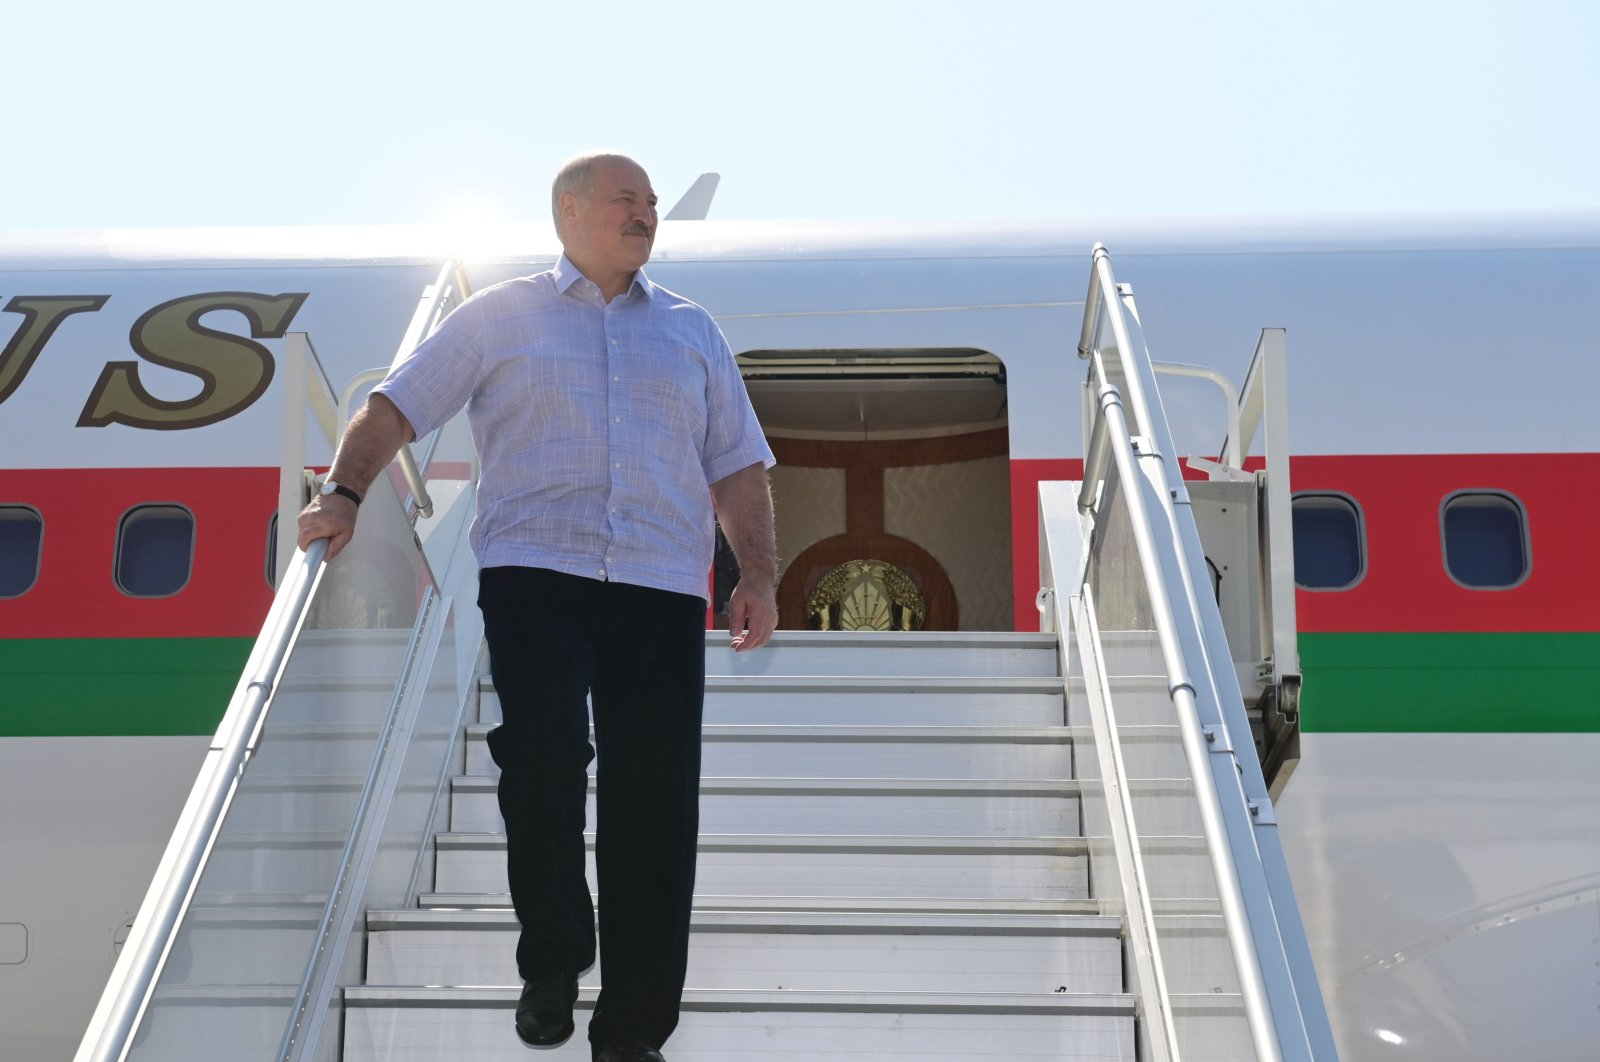 Belarus' President Alexander Lukashenko disembarks from a plane as he arrives at an airport, Sochi, Sept. 14, 2020. (AFP Photo)